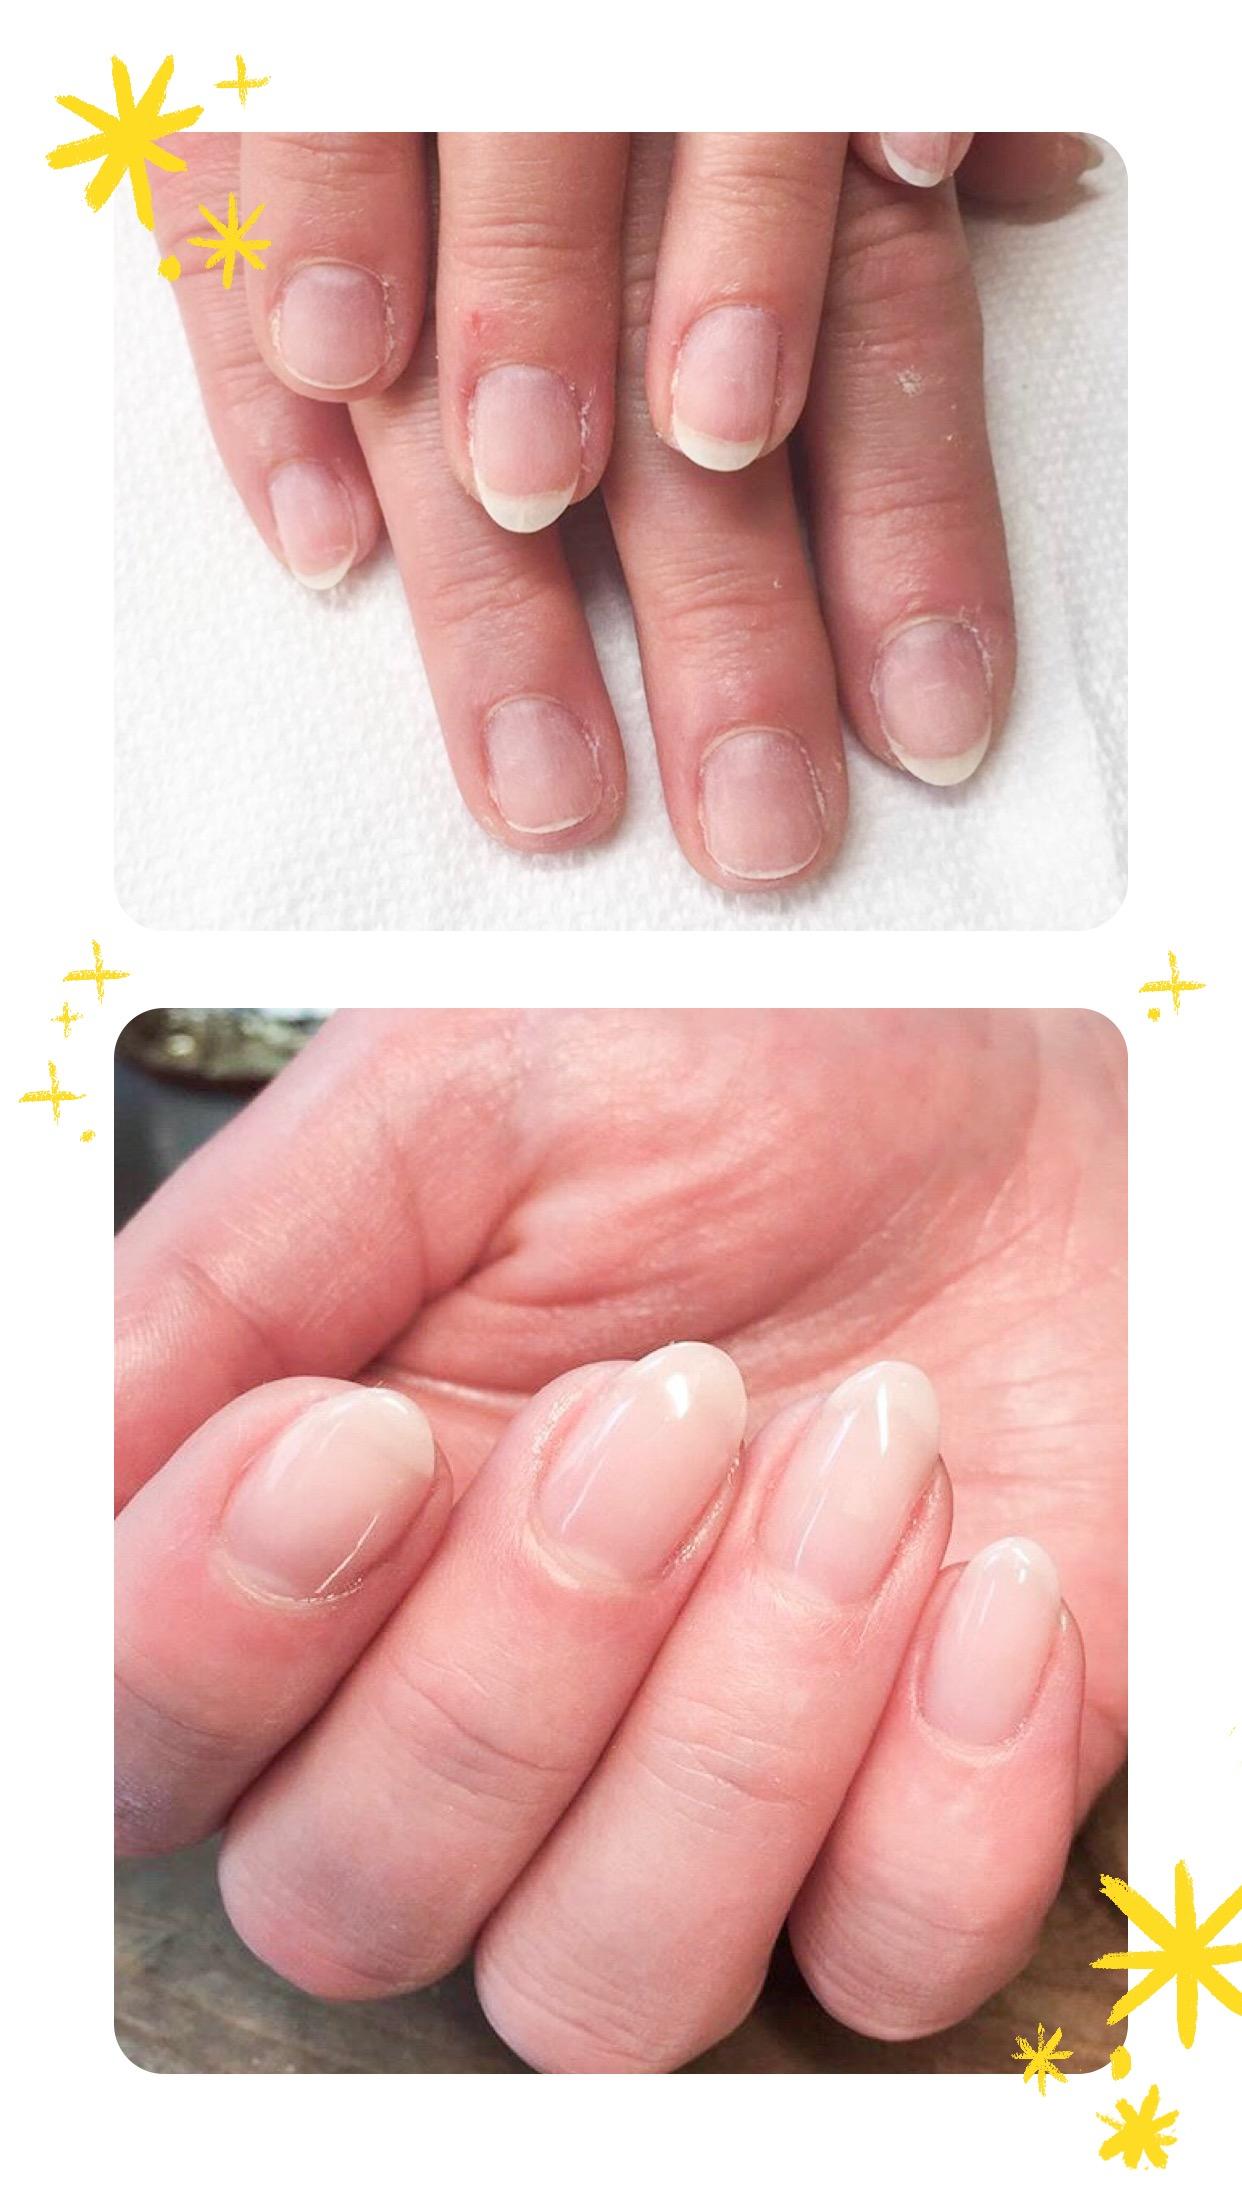 Multiflex hard gel manicure